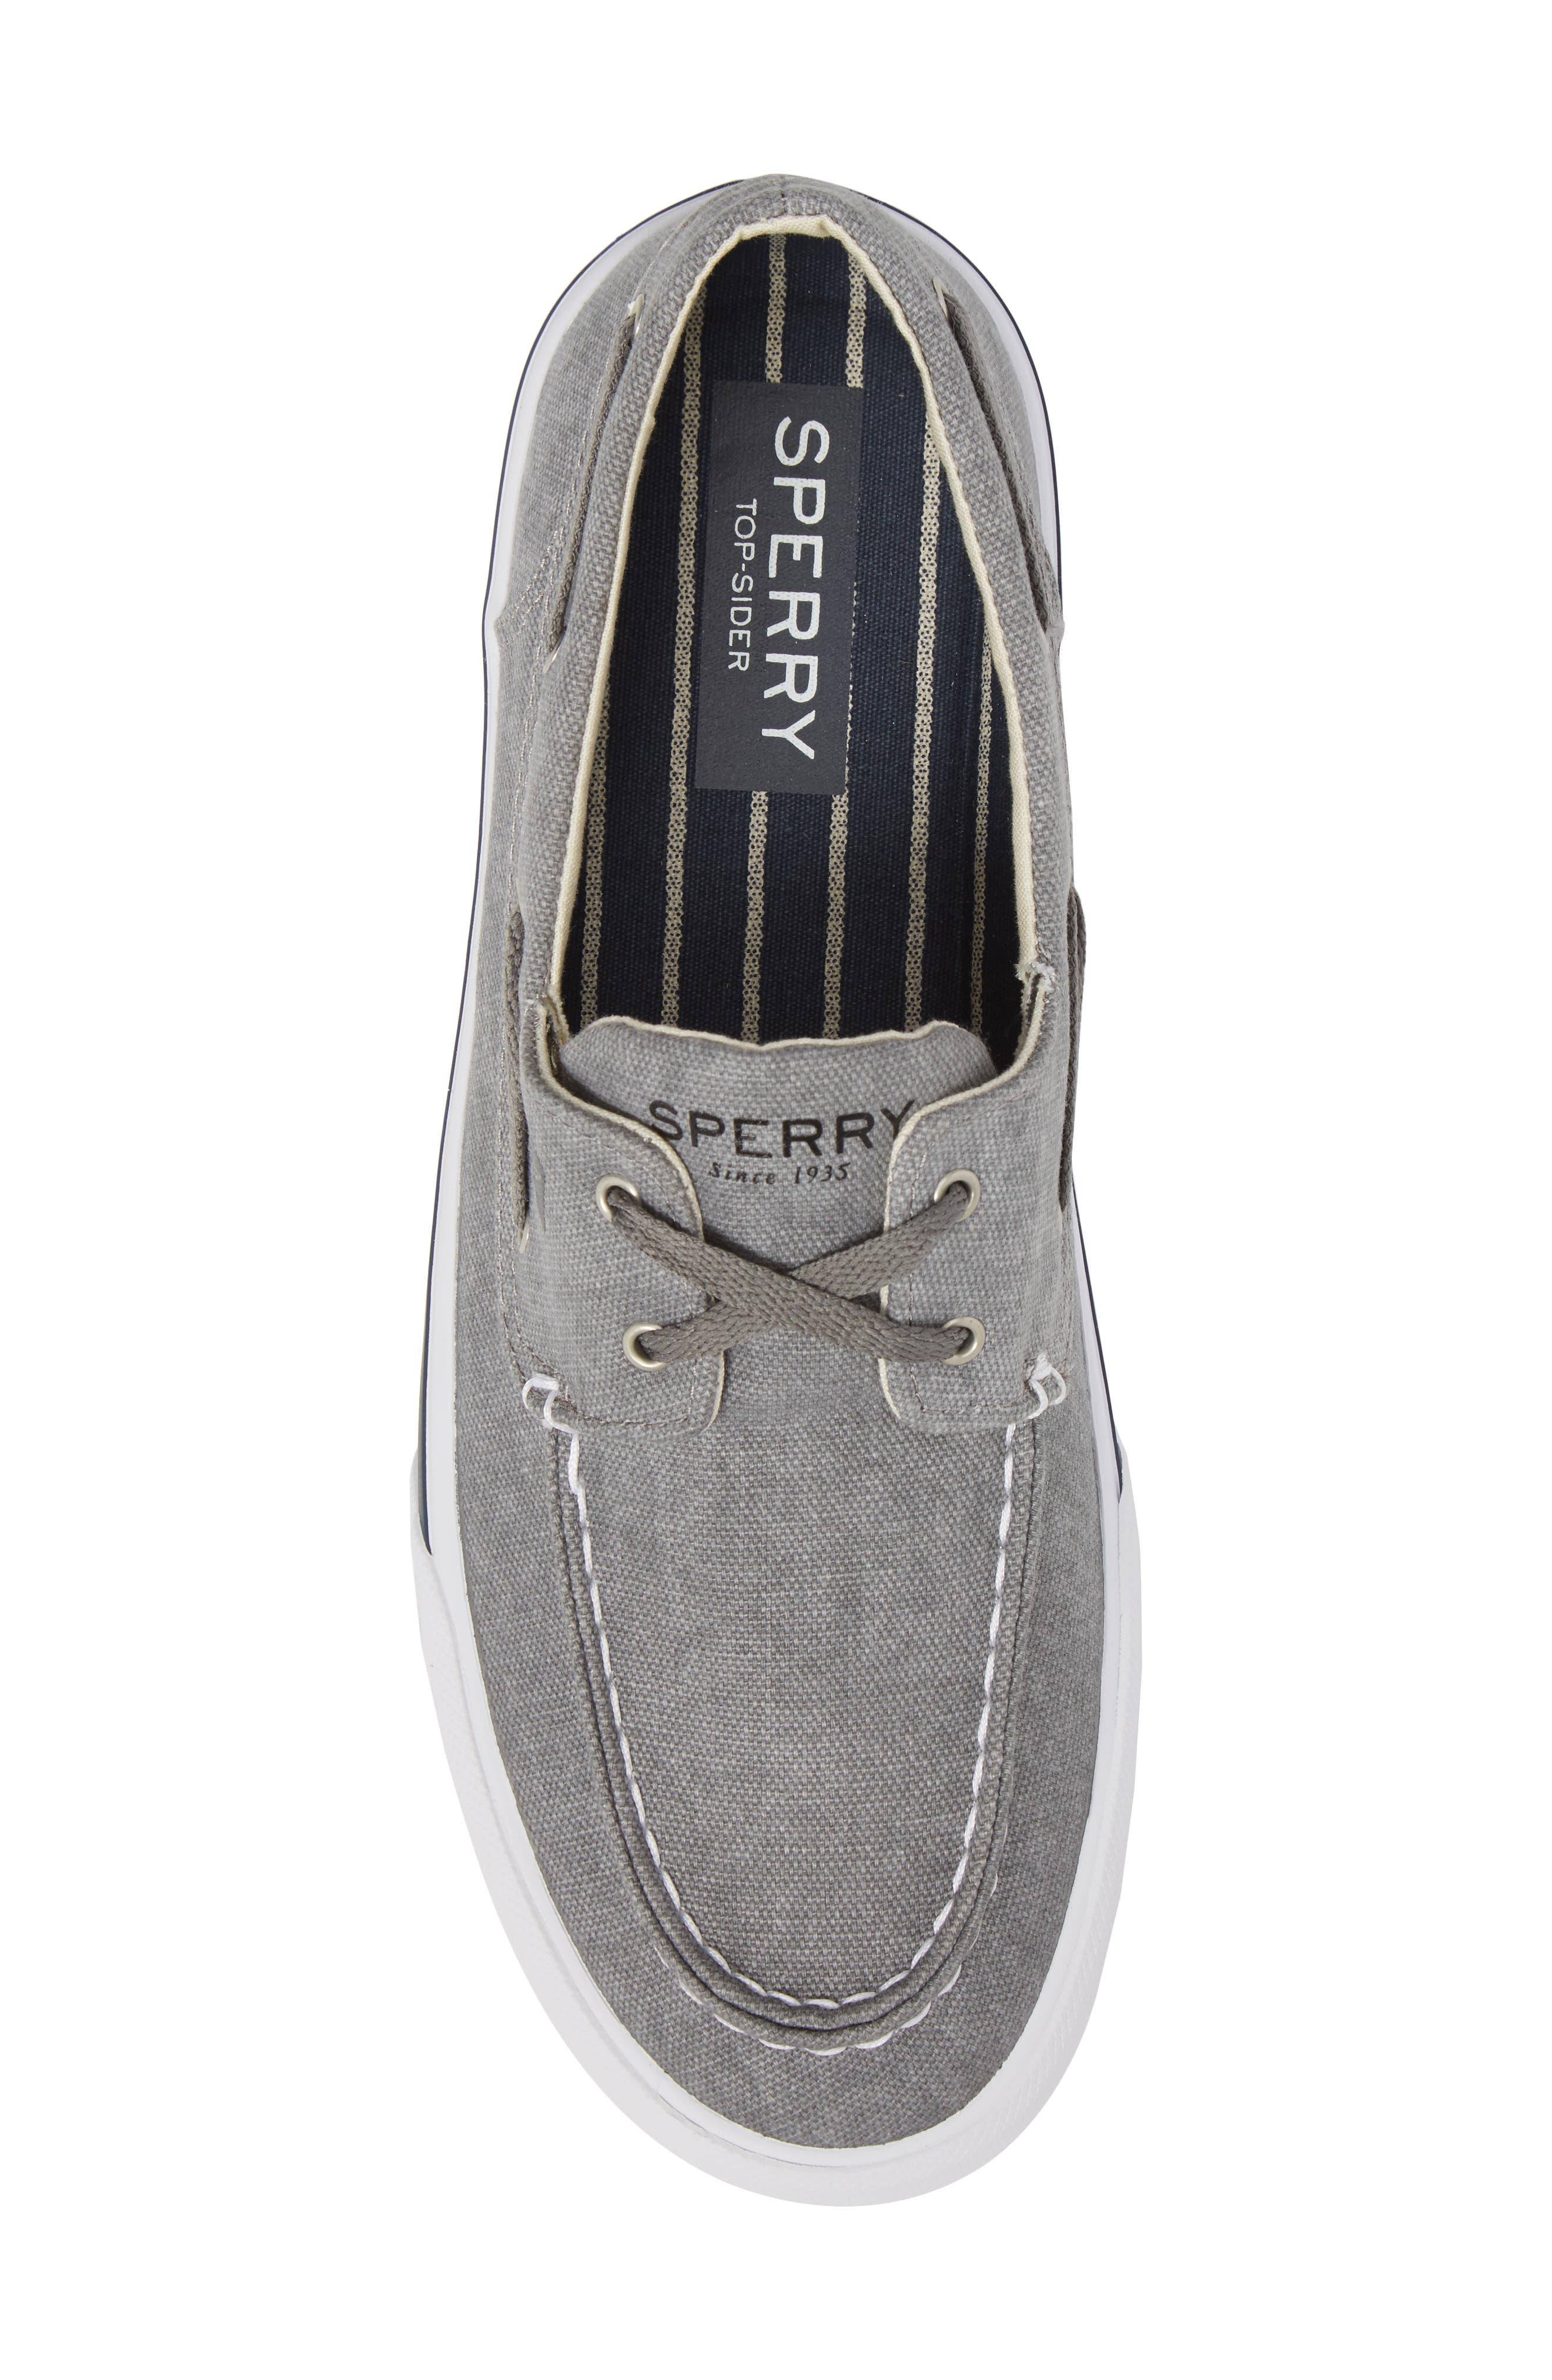 SPERRY, Striper 2 Boat Shoe, Alternate thumbnail 5, color, GREY CANVAS